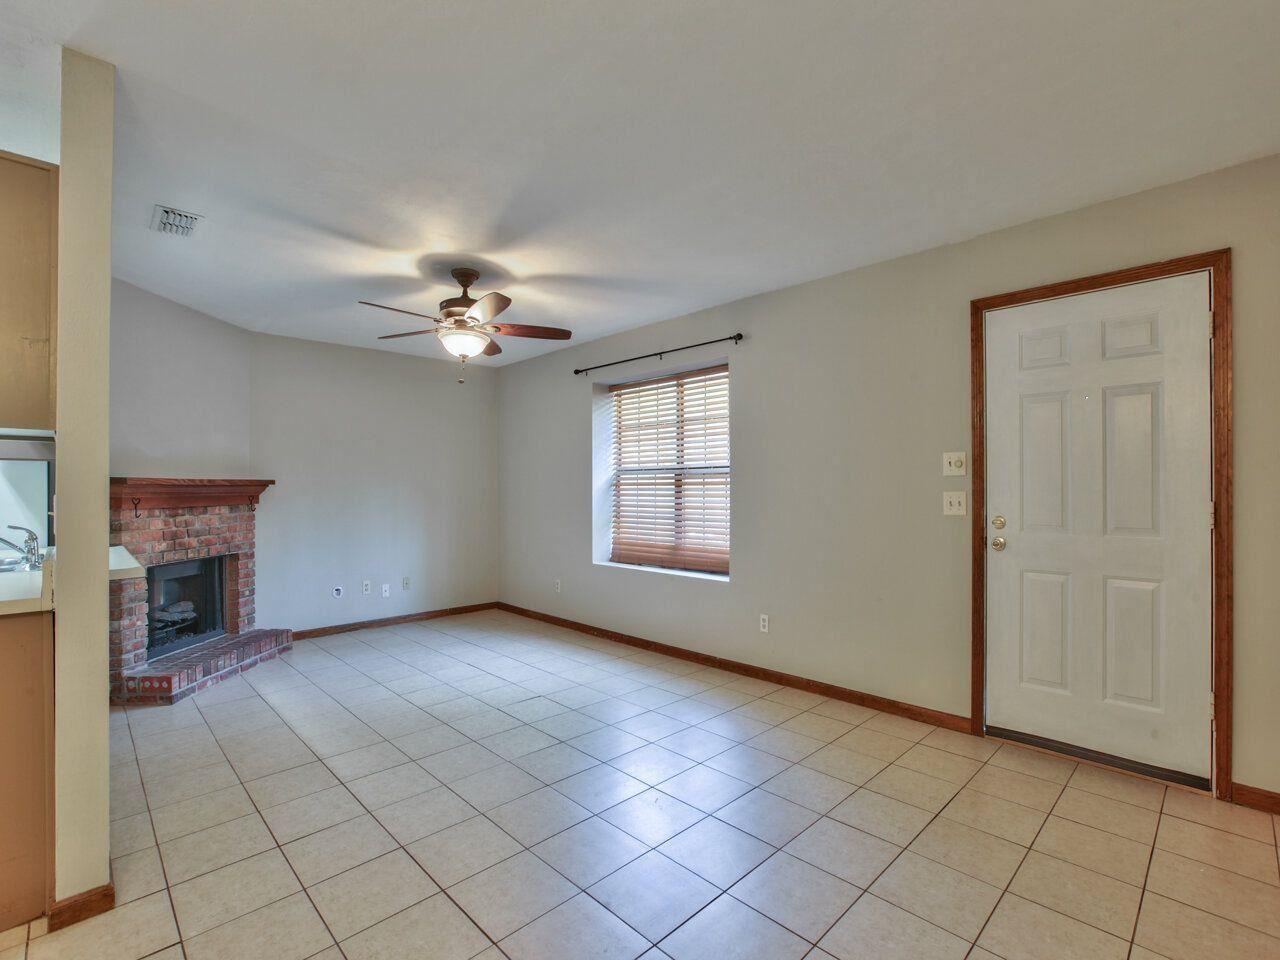 Photo of 2106 VICTORY GARDEN Lane #-, TALLAHASSEE, FL 32301 (MLS # 332347)